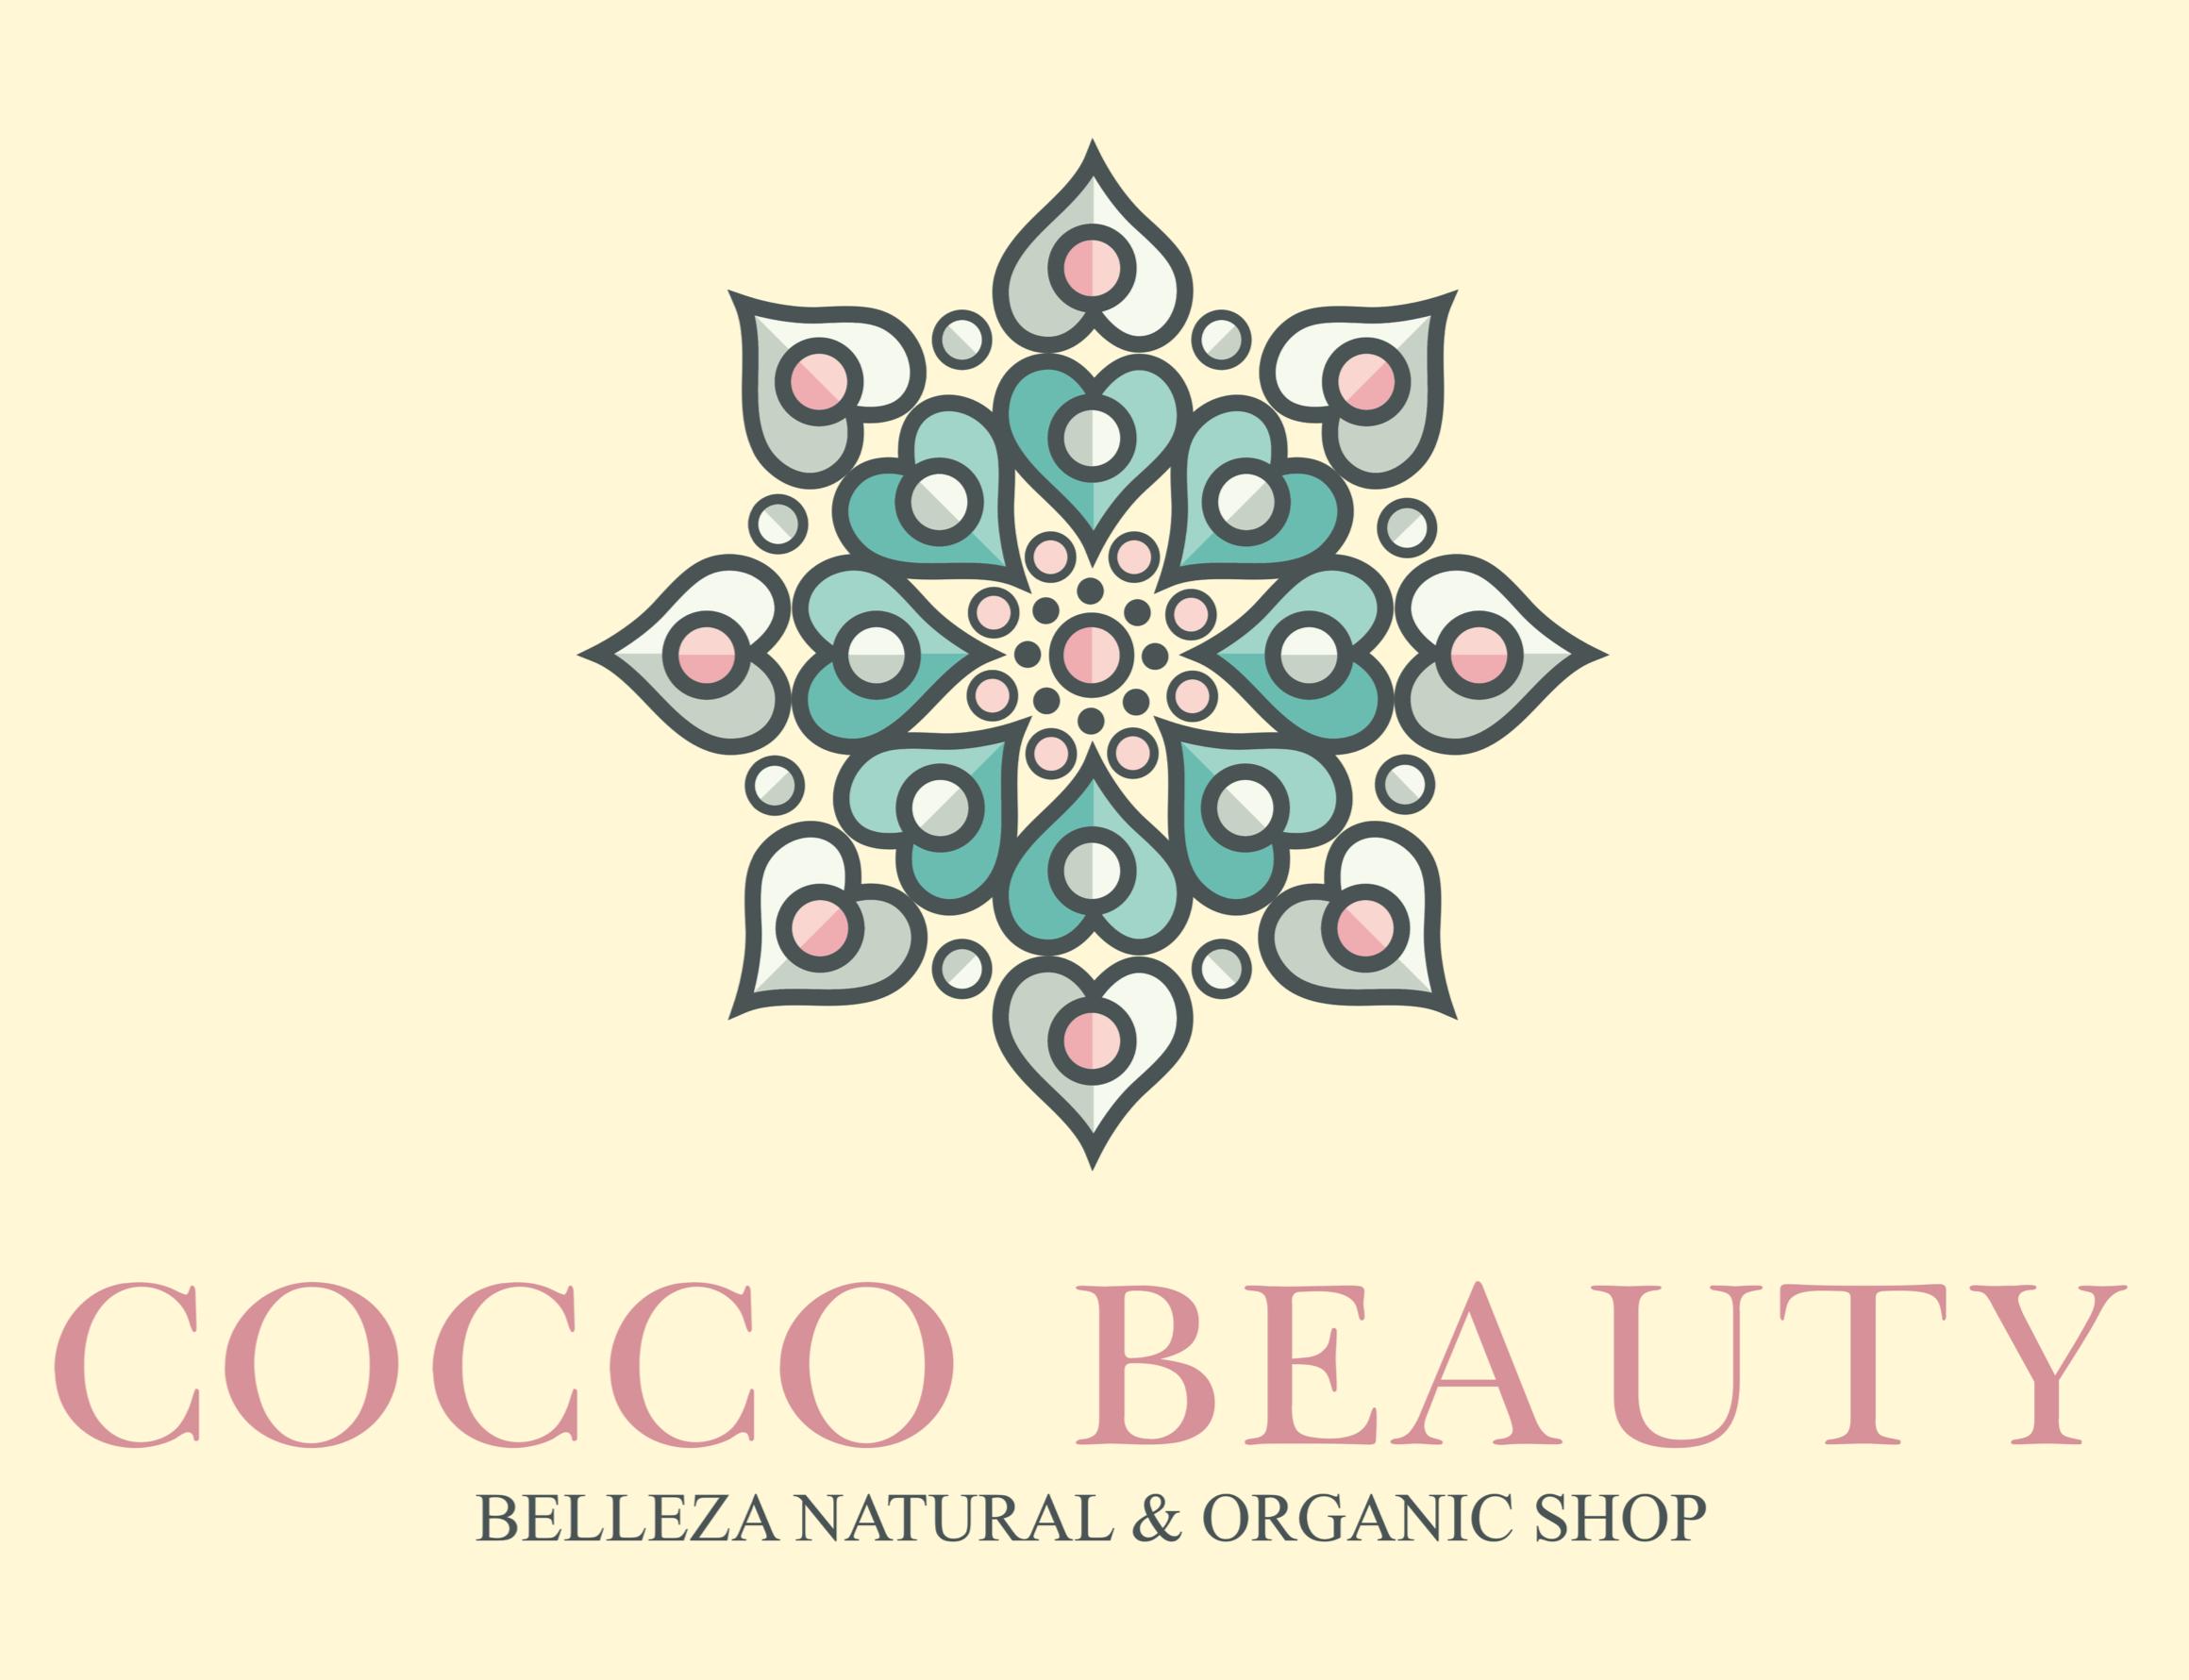 Cocco Beauty